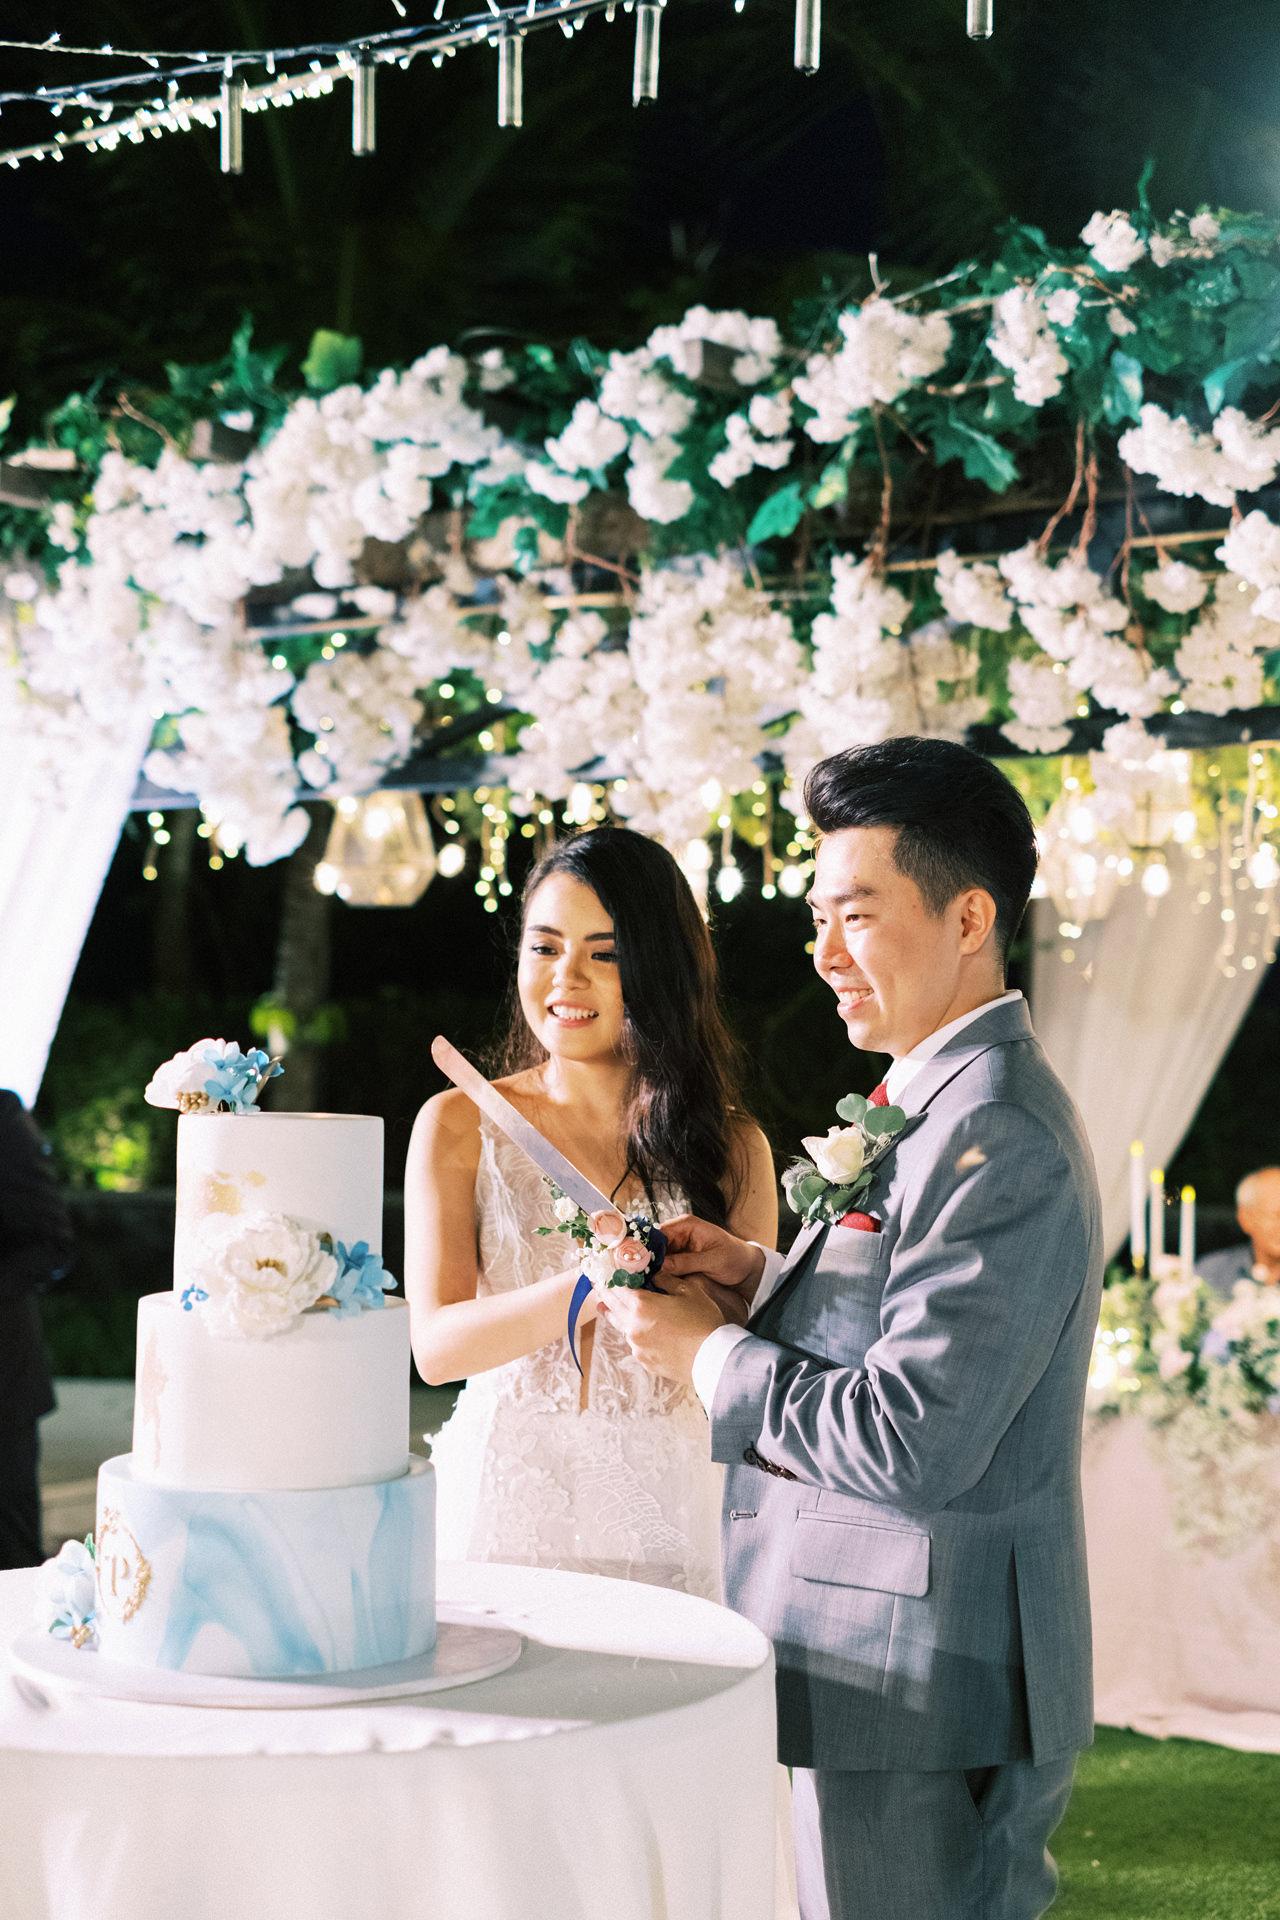 Bali Wedding Cake by Butter Bali